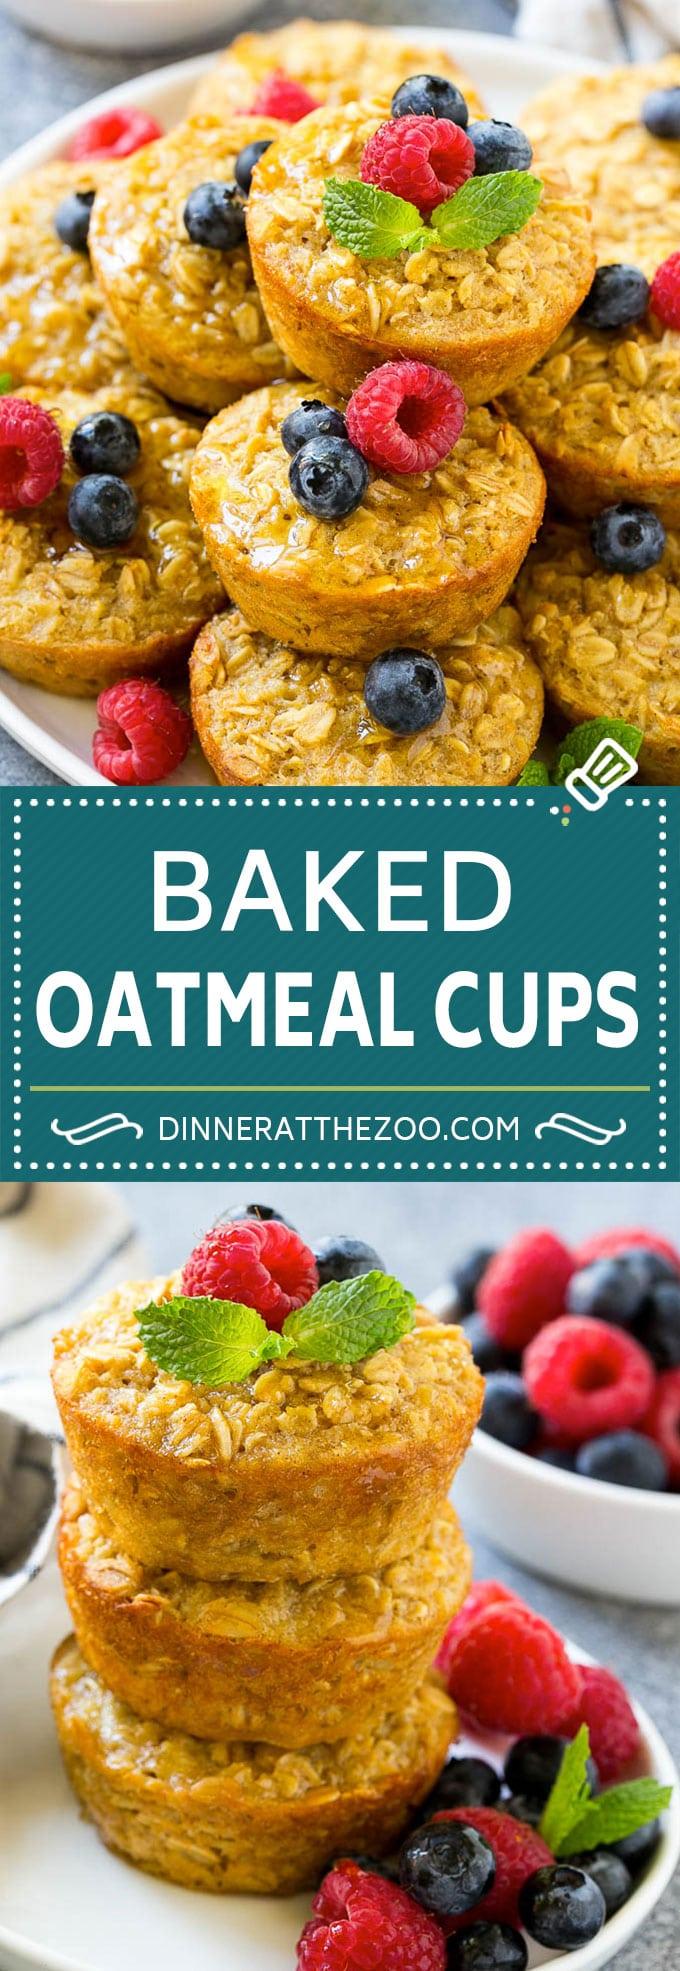 Baked Oatmeal Cups Recipe | Baked Oatmeal | Meal Prep Oatmeal | Oatmeal Muffins #oatmeal #breakfast #dinneratthezoo